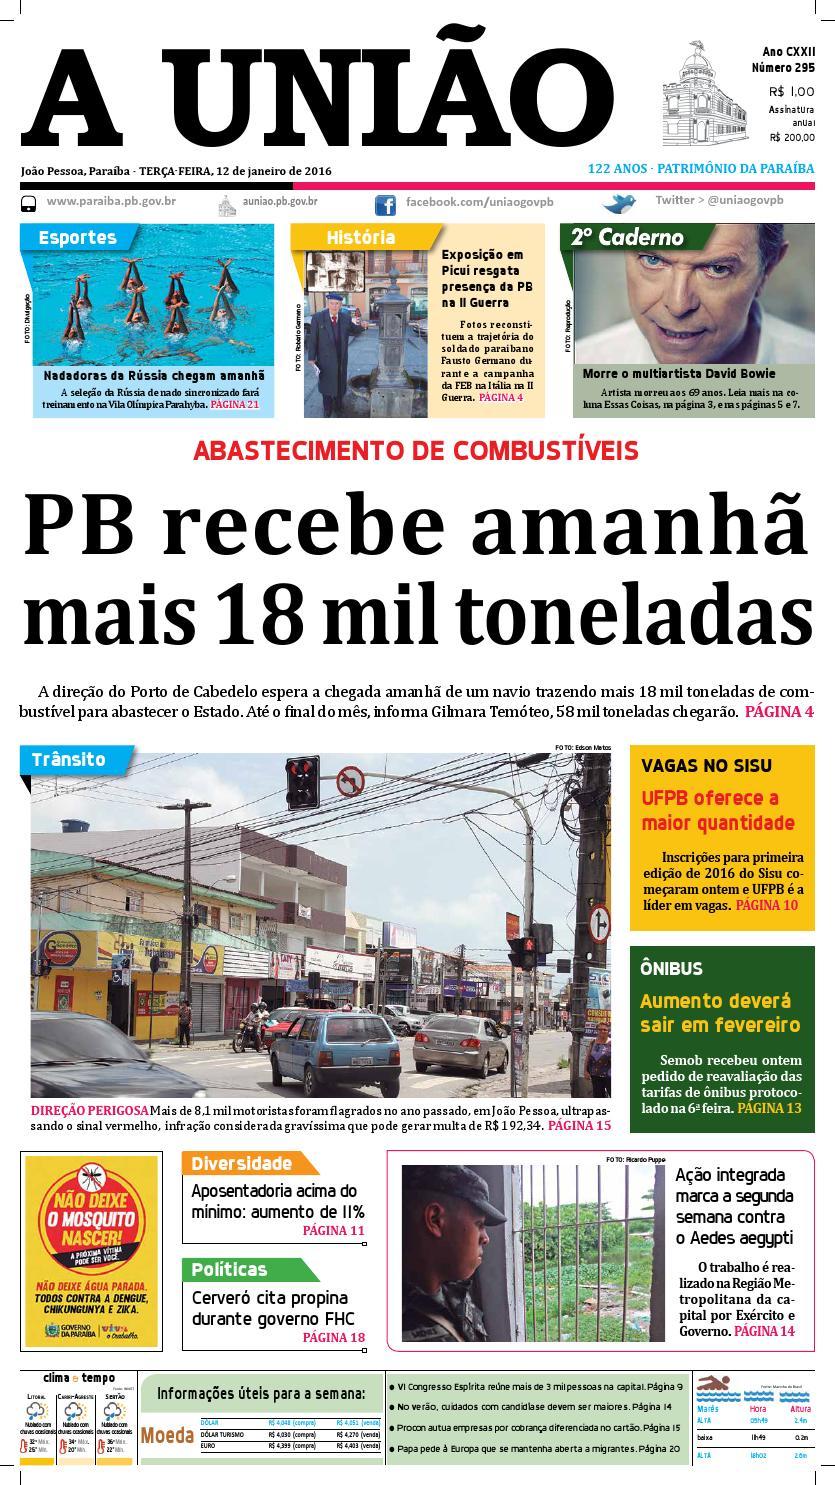 08497c2093 Jornal A União 12 01 16 by Jornal A União - issuu